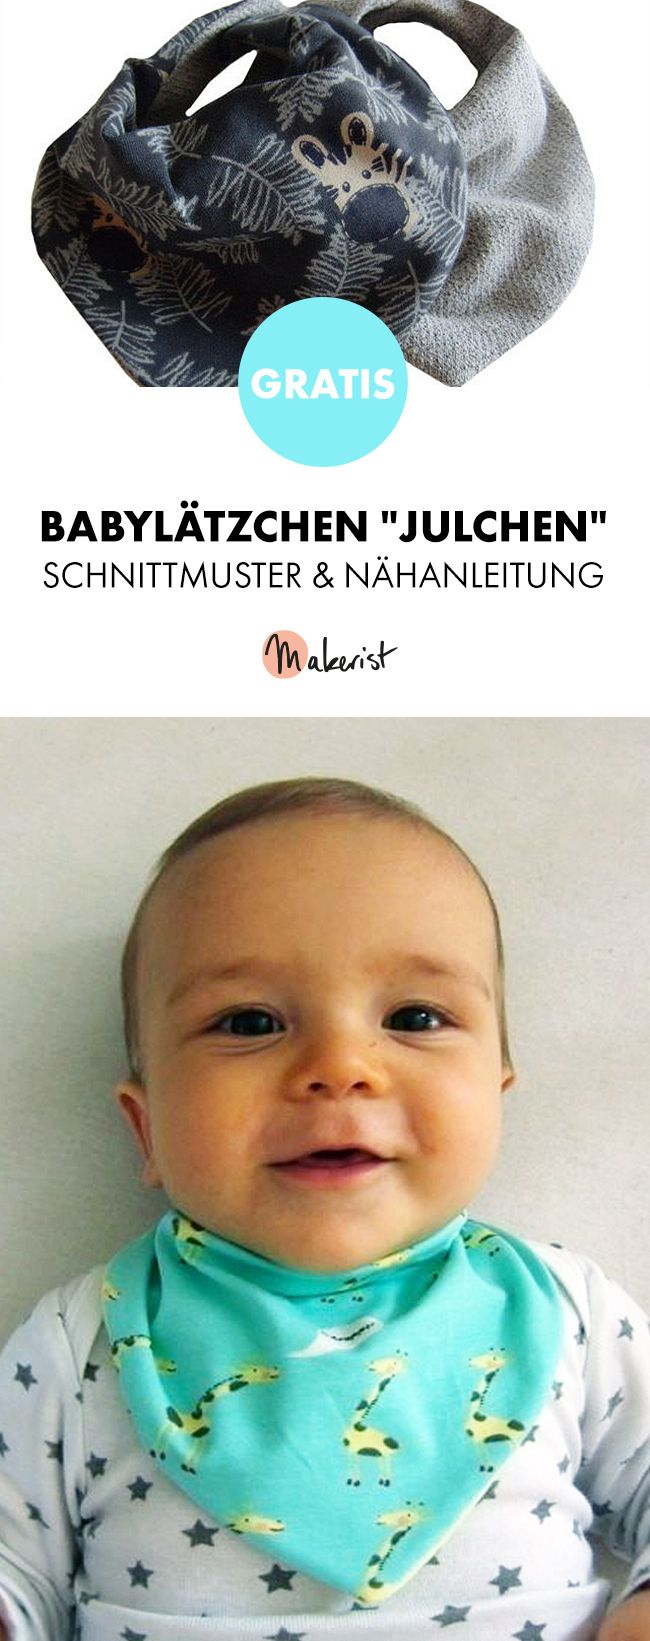 Gratisanleitung: Babylätzchen nähen - Schnittmuster und Nähanleitung via Makerist.de #bibsforbaby